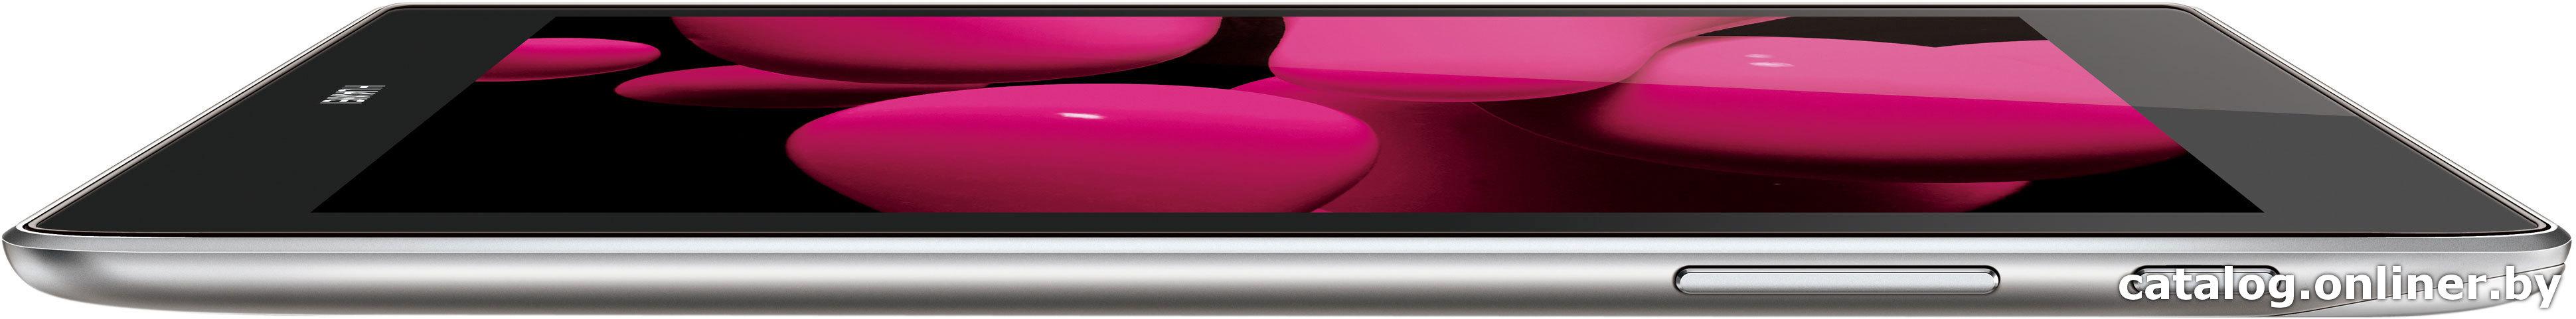 10 1 планшет huawei mediapad 10 link 16gb 3g lte silver